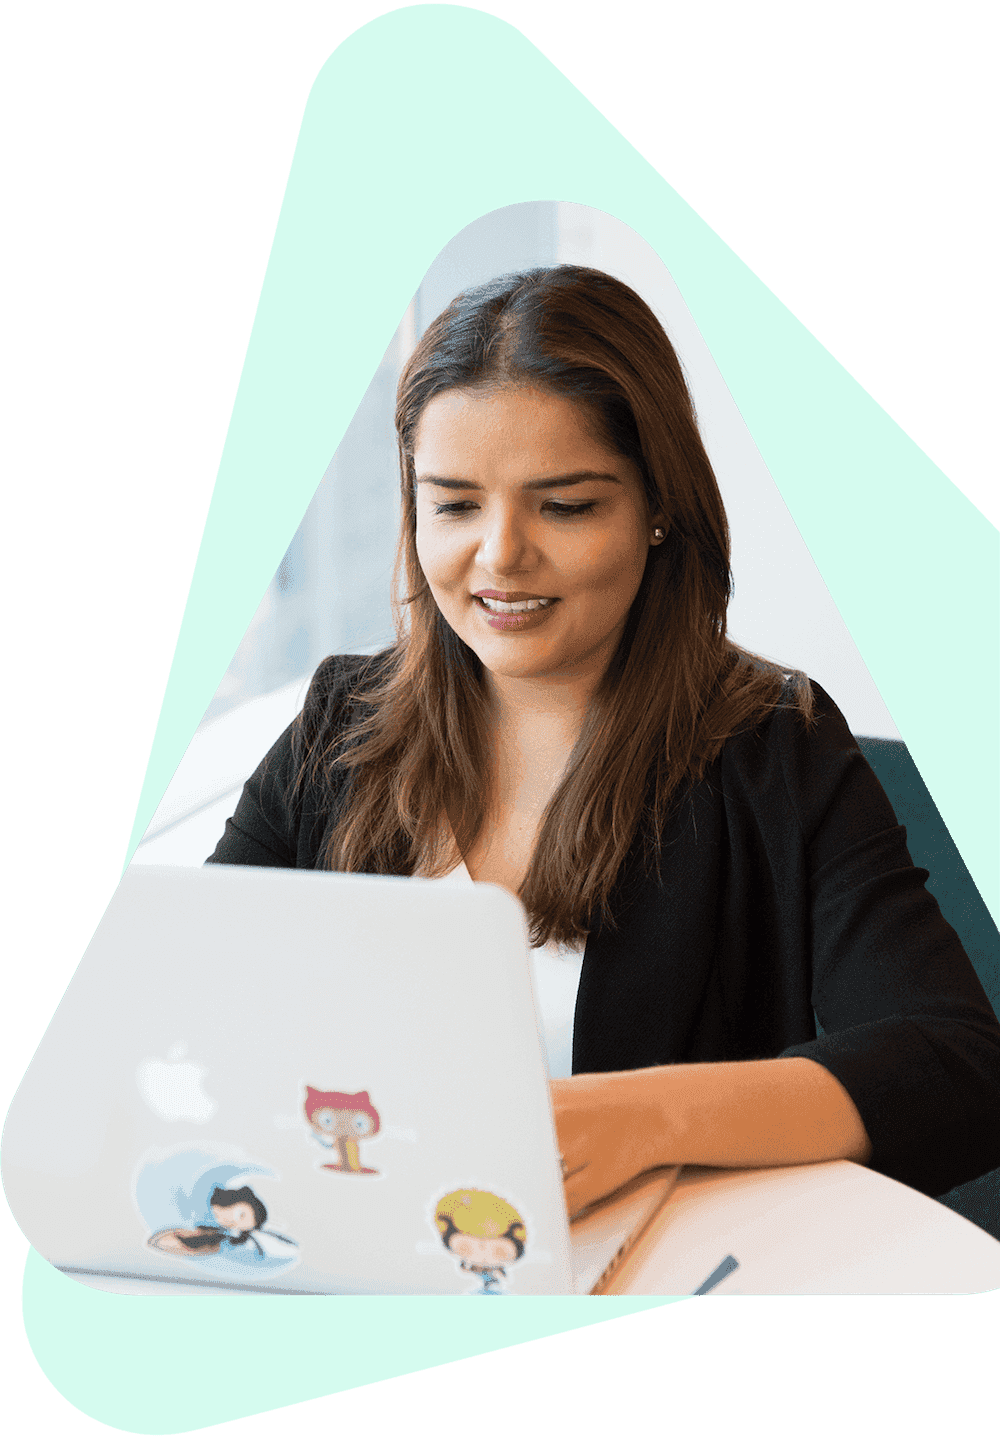 microverse: woman working